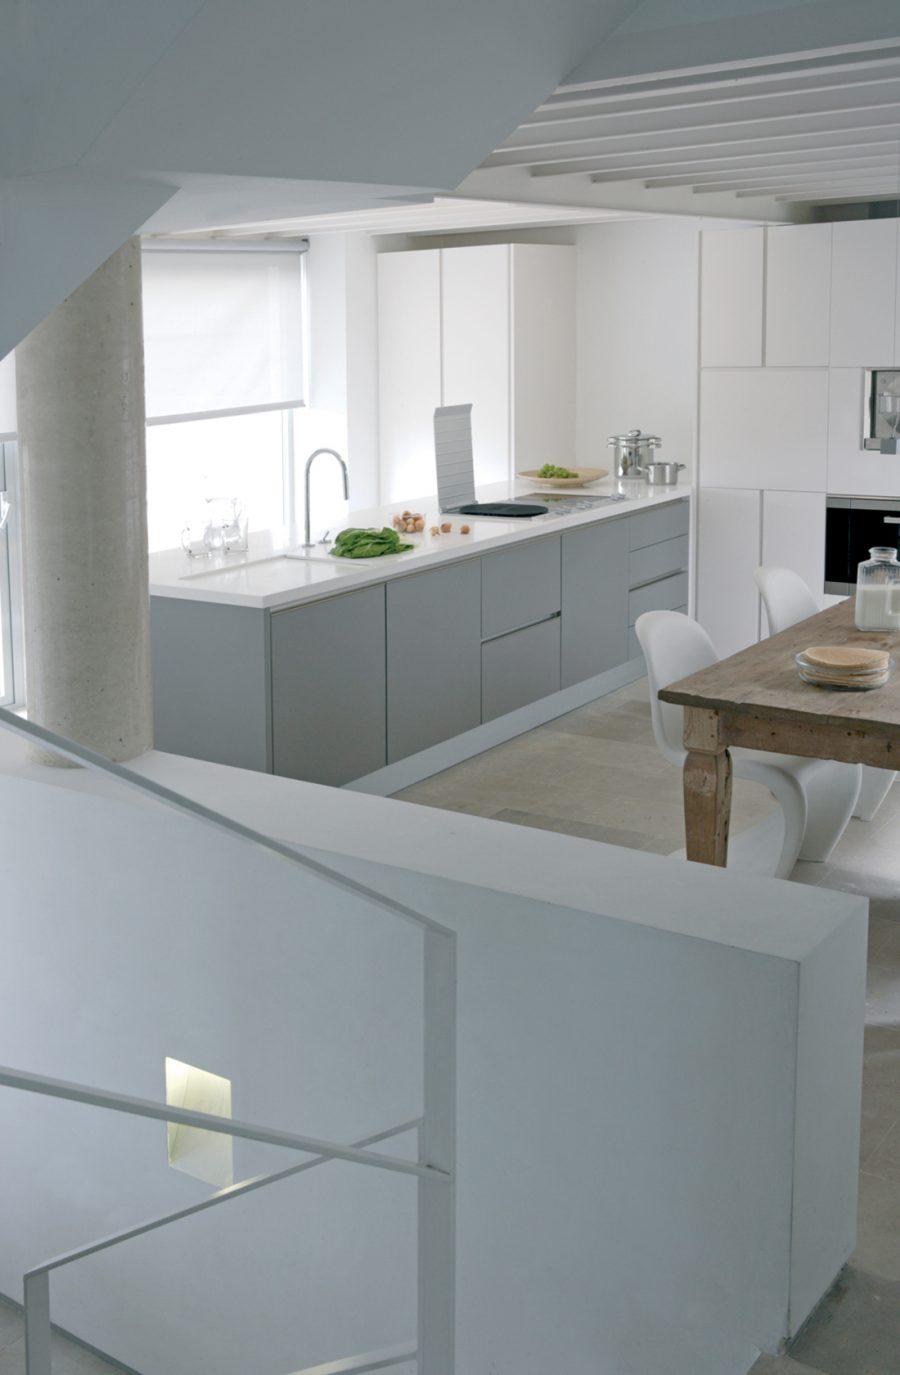 Casa c 29 cocina 4